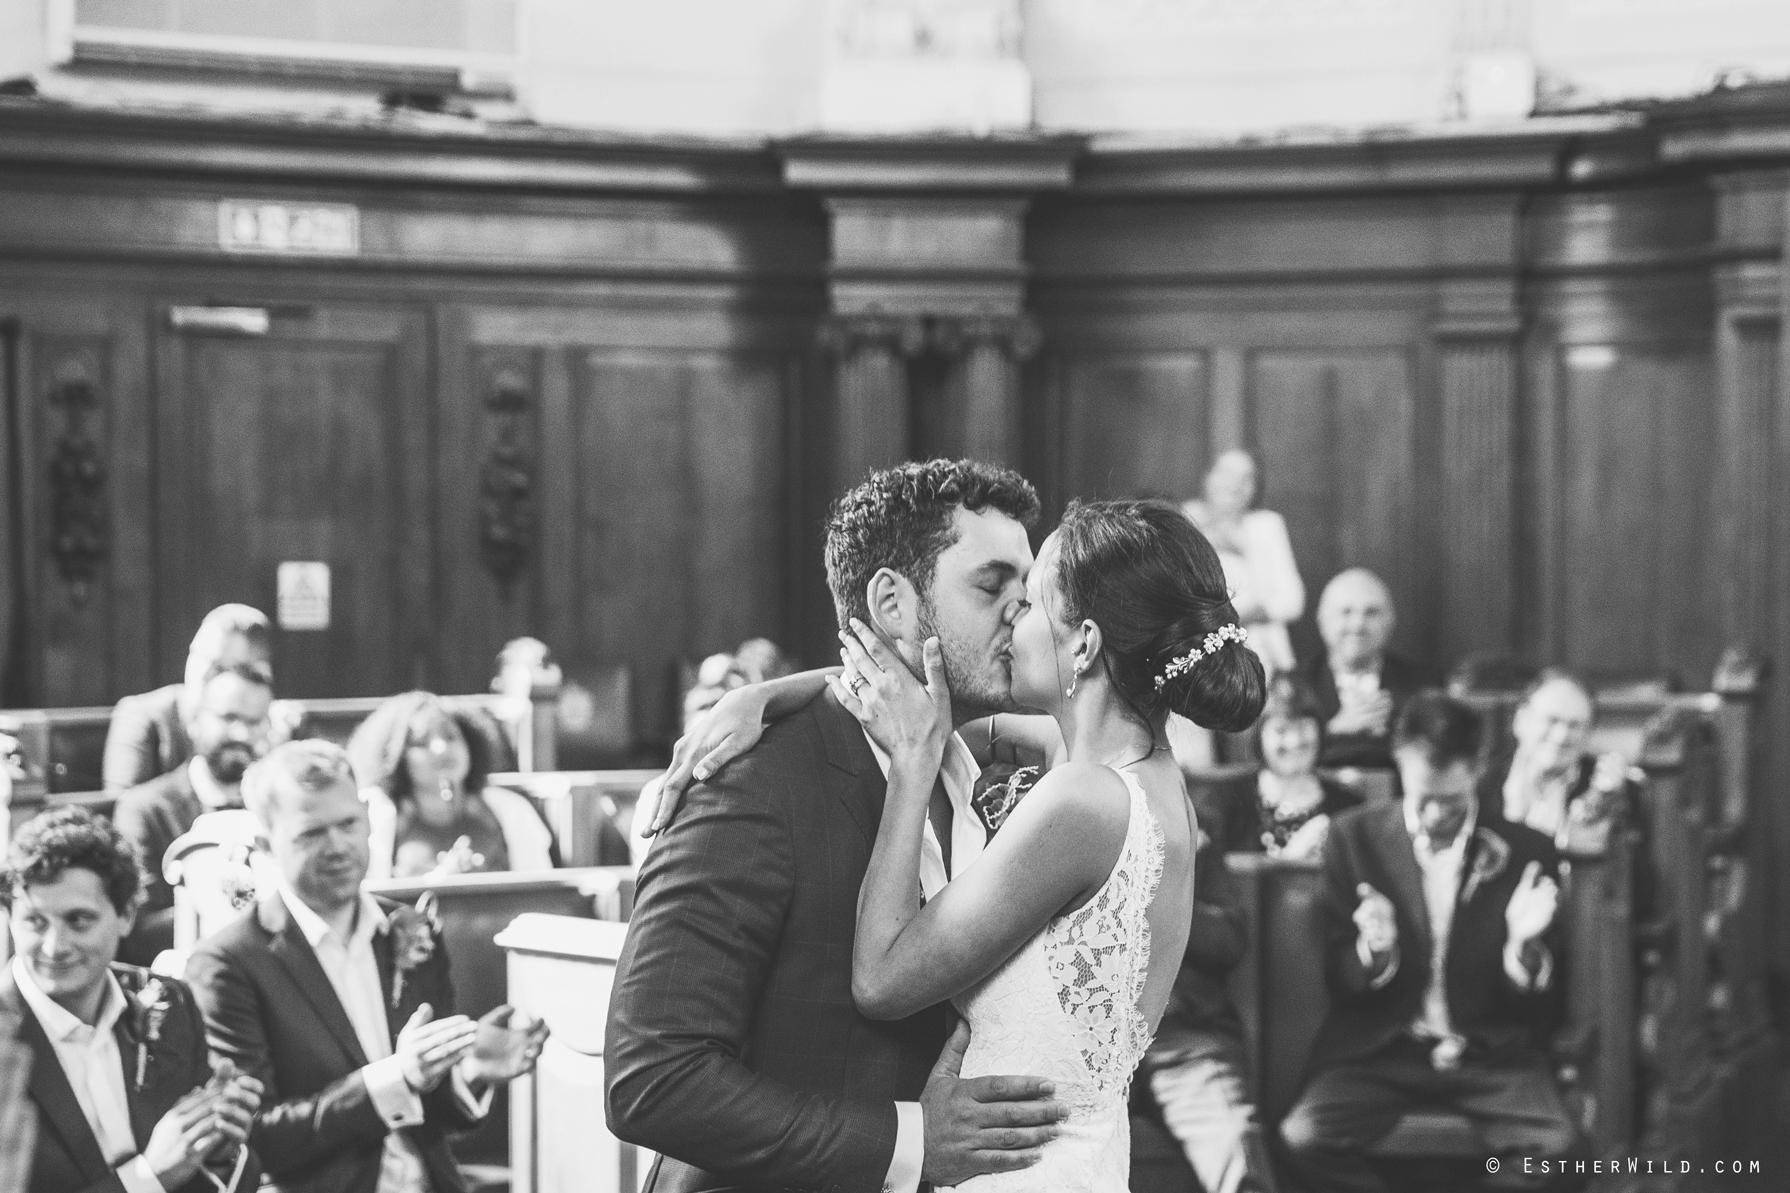 Islington_Town_Hall_Wedding_London_Photographer_Esther_Wild_IMG_4934-1.jpg